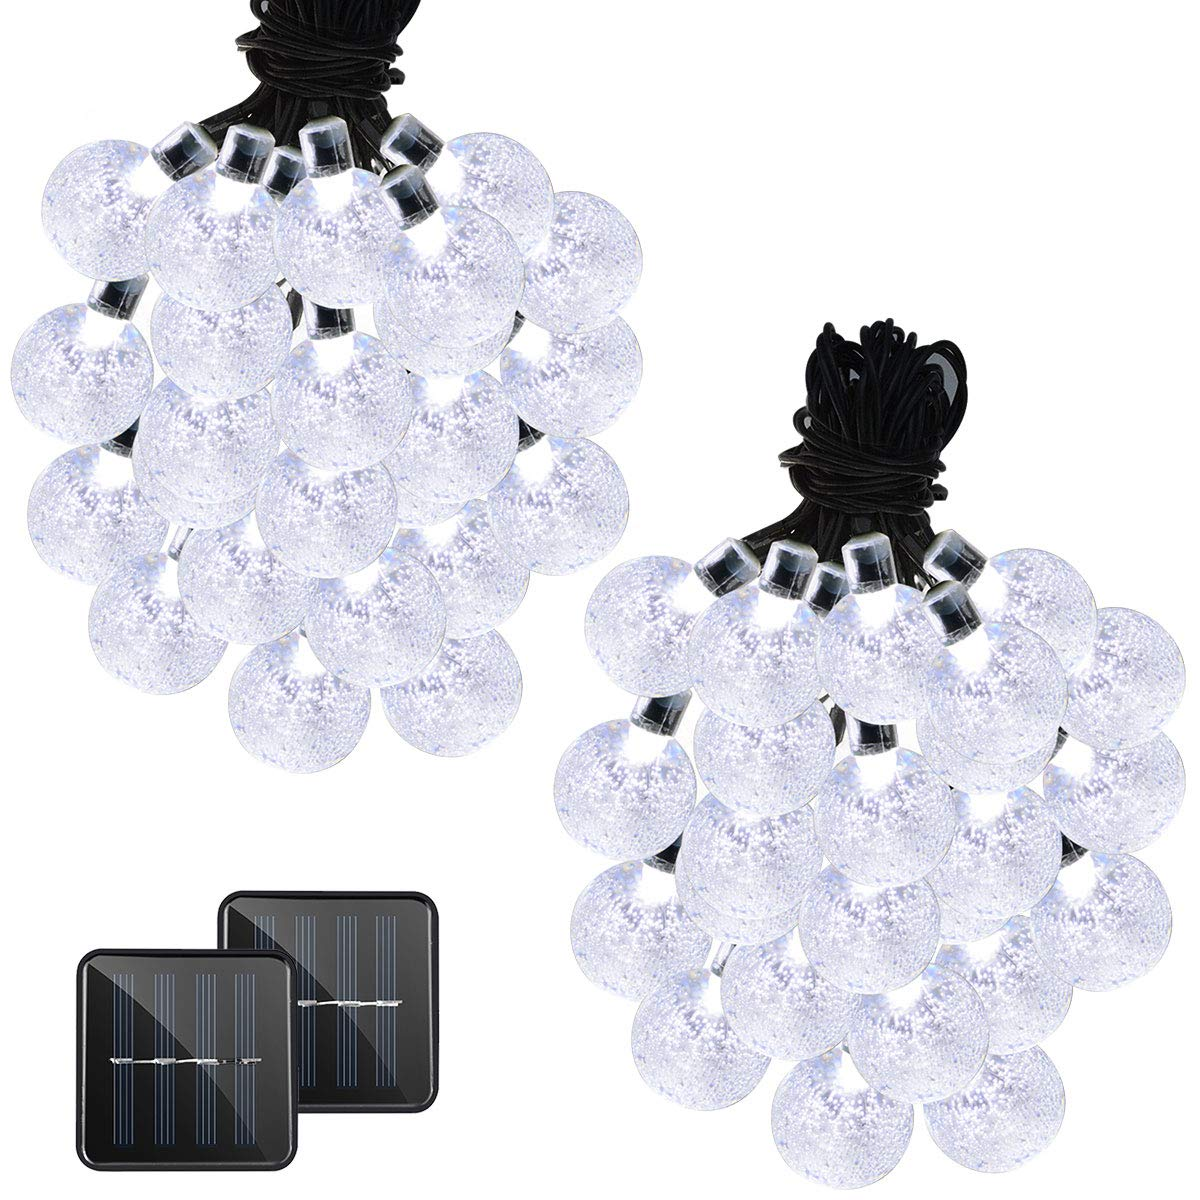 VMANOO Christmas Solar Powered Globe Lights,30 LED (19.7ft) Globe Ball Fairy String Light for Outdoor, Xmas Tree, Garden, Patio, Home, Lawn, Holiday, Wedding Decor, Party 2 Pack (White)